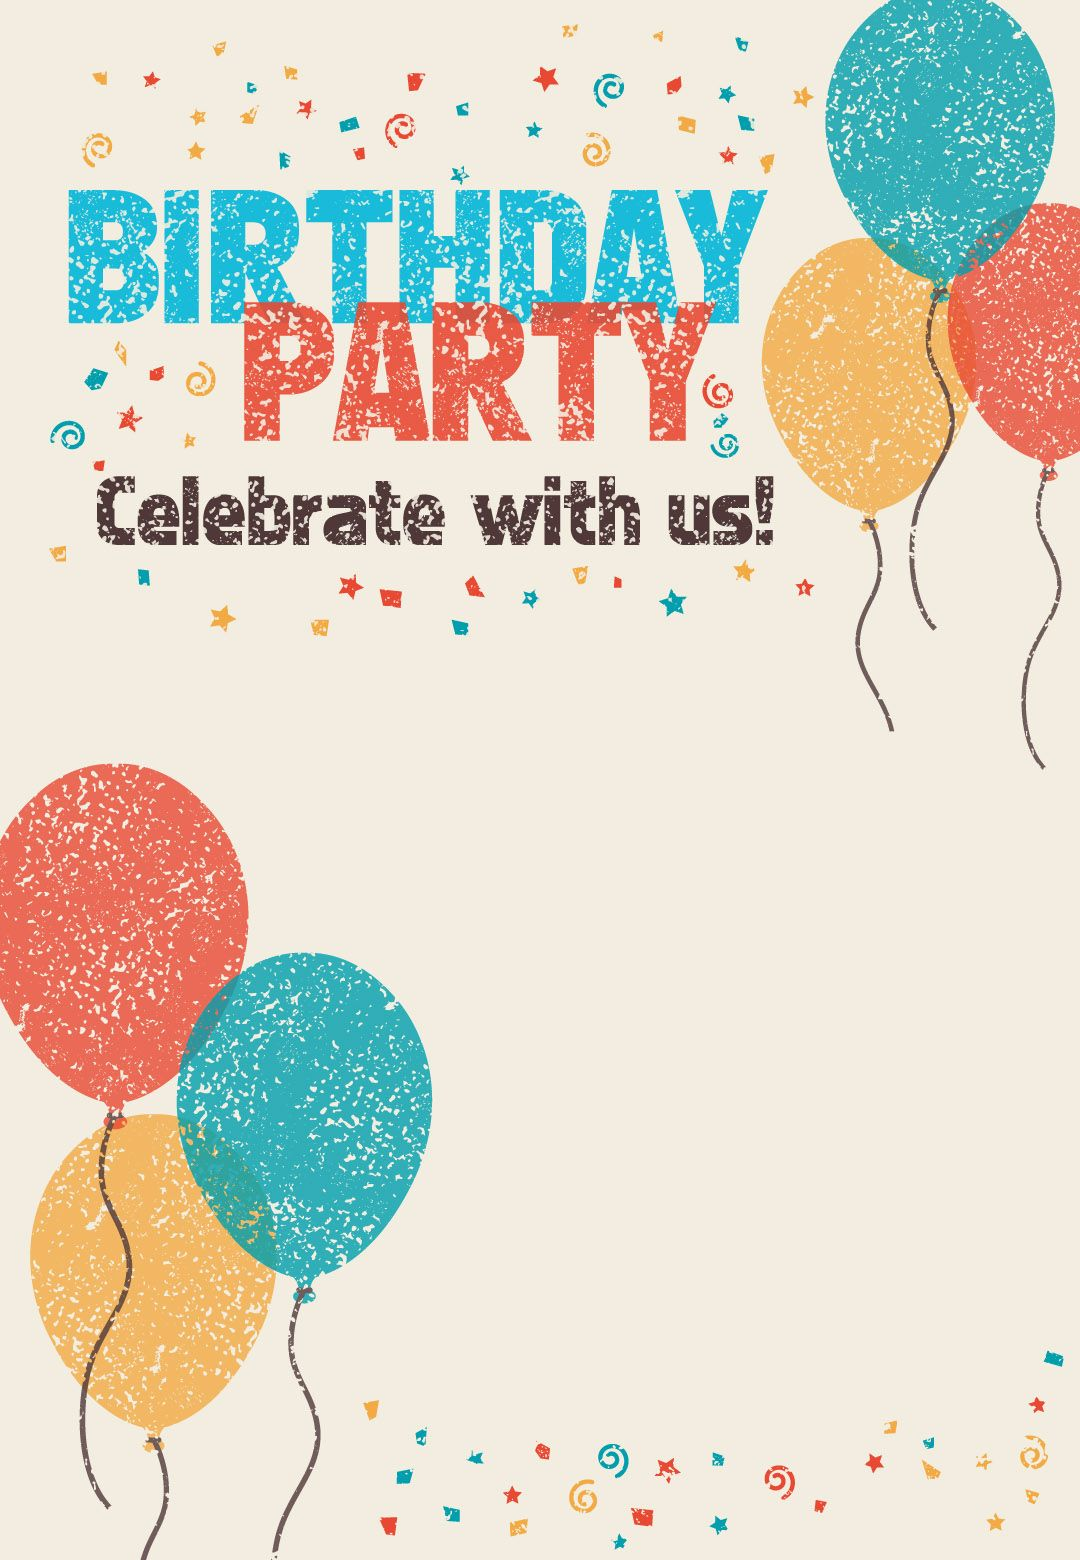 Celebrate With Us Free Birthday Invitation Template Greetings Birthday Party Invitations Printable Happy Birthday Invitation Card Invitation Card Birthday